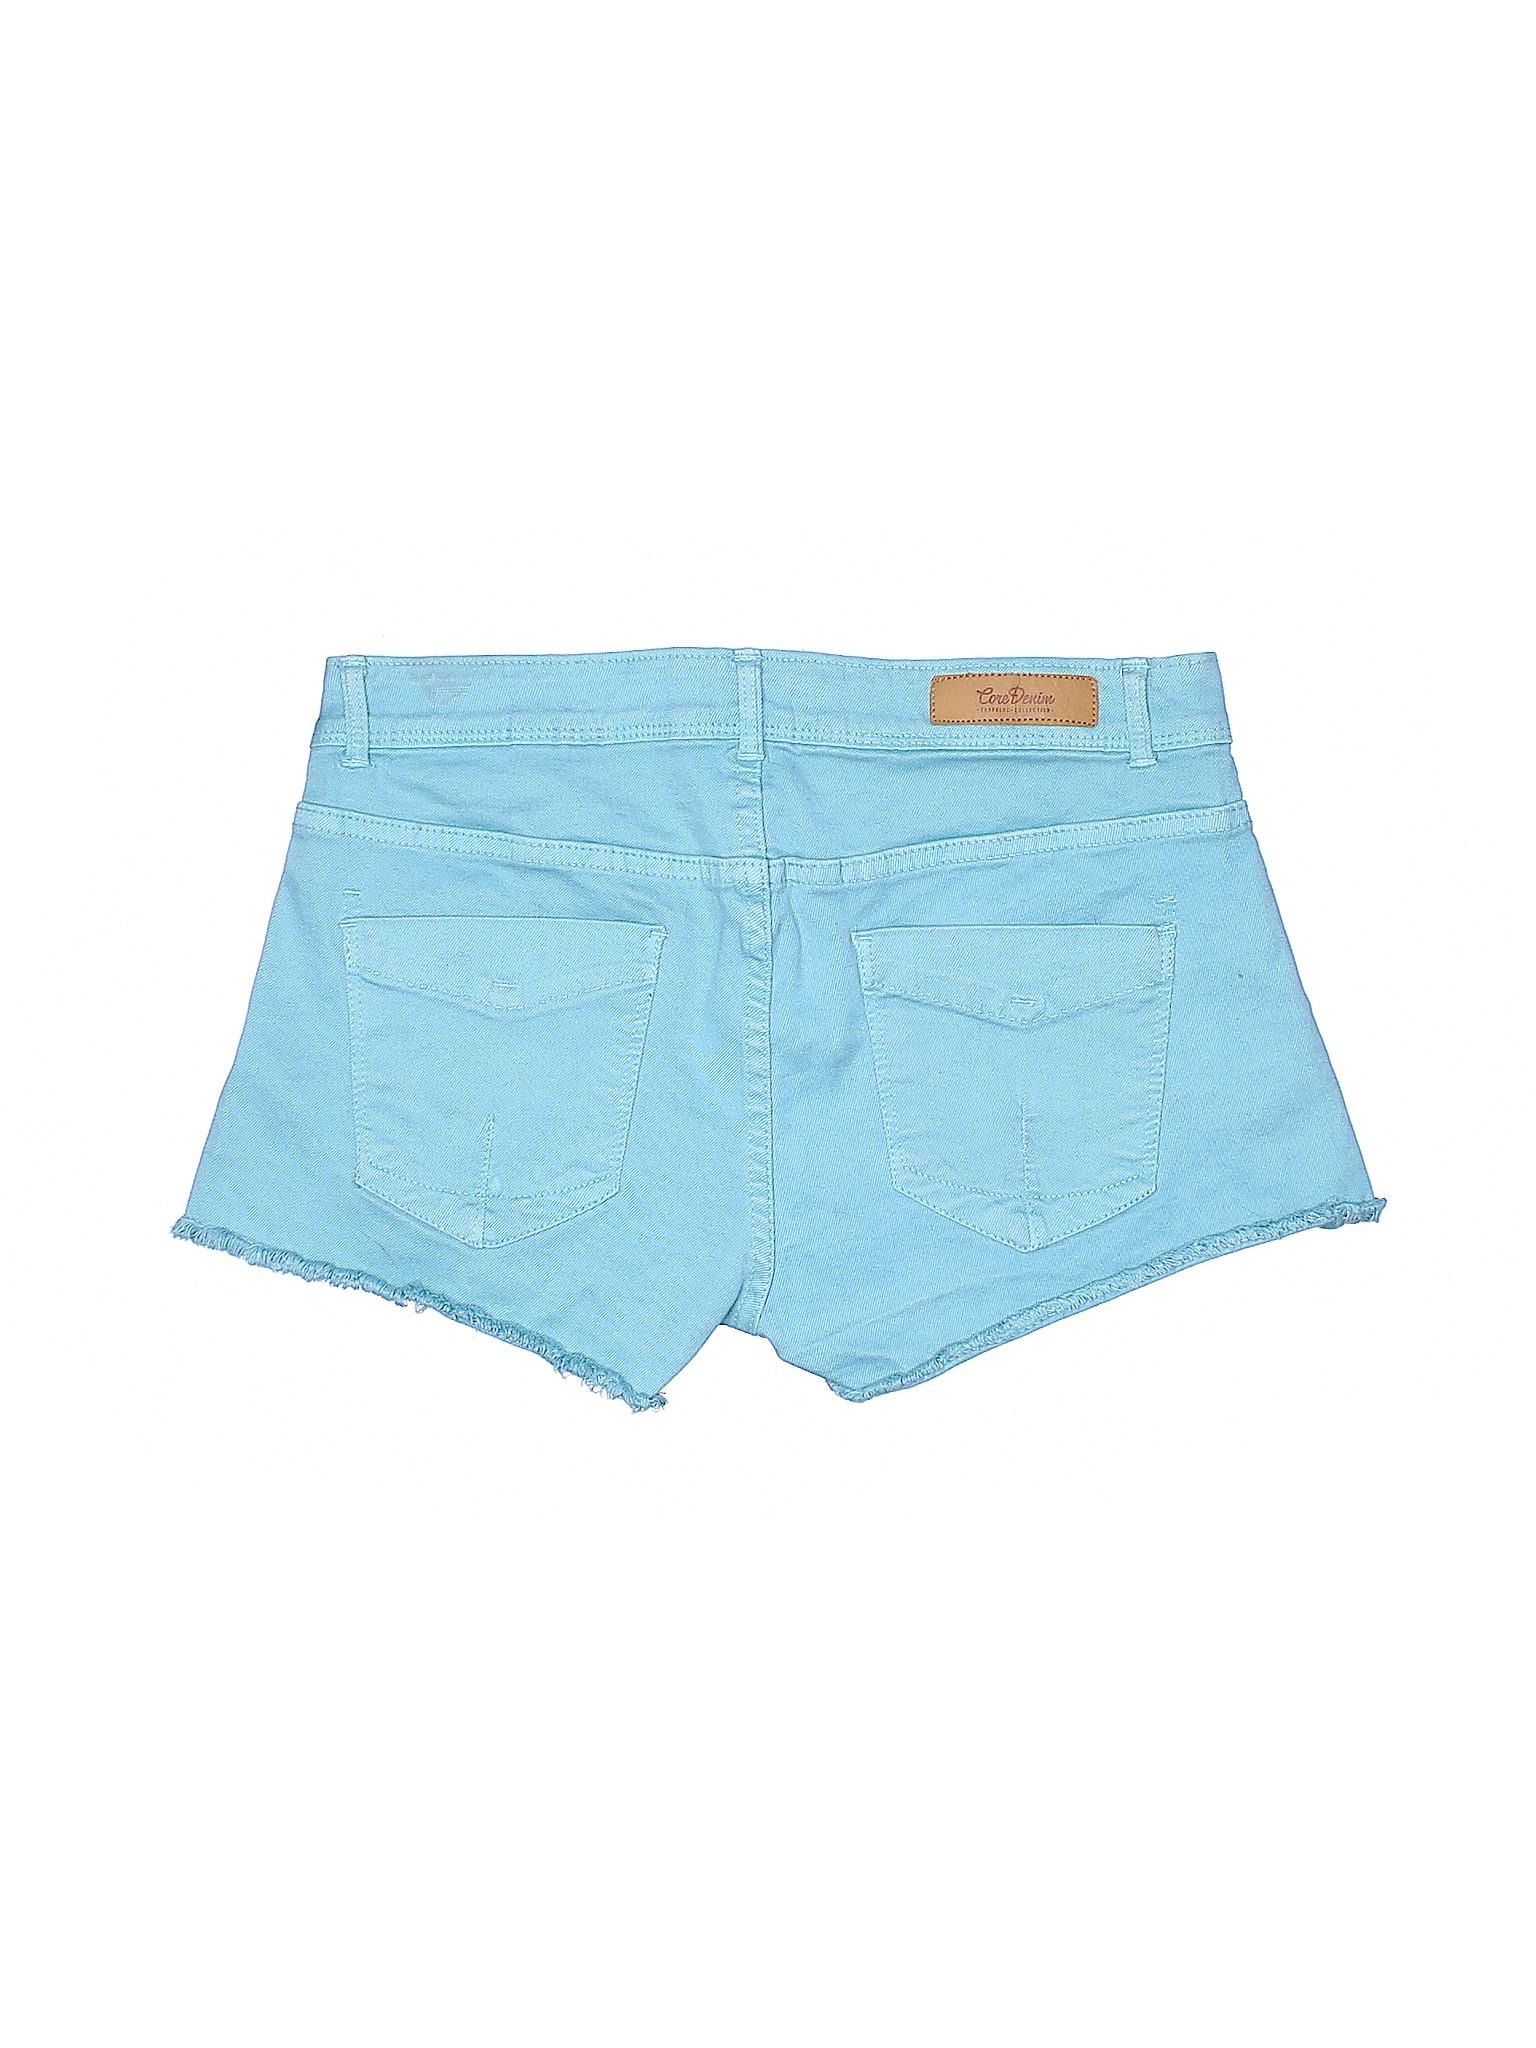 Denim Shorts Denim Zara Denim Shorts Zara Boutique Zara Boutique Boutique xqgnpgPFX